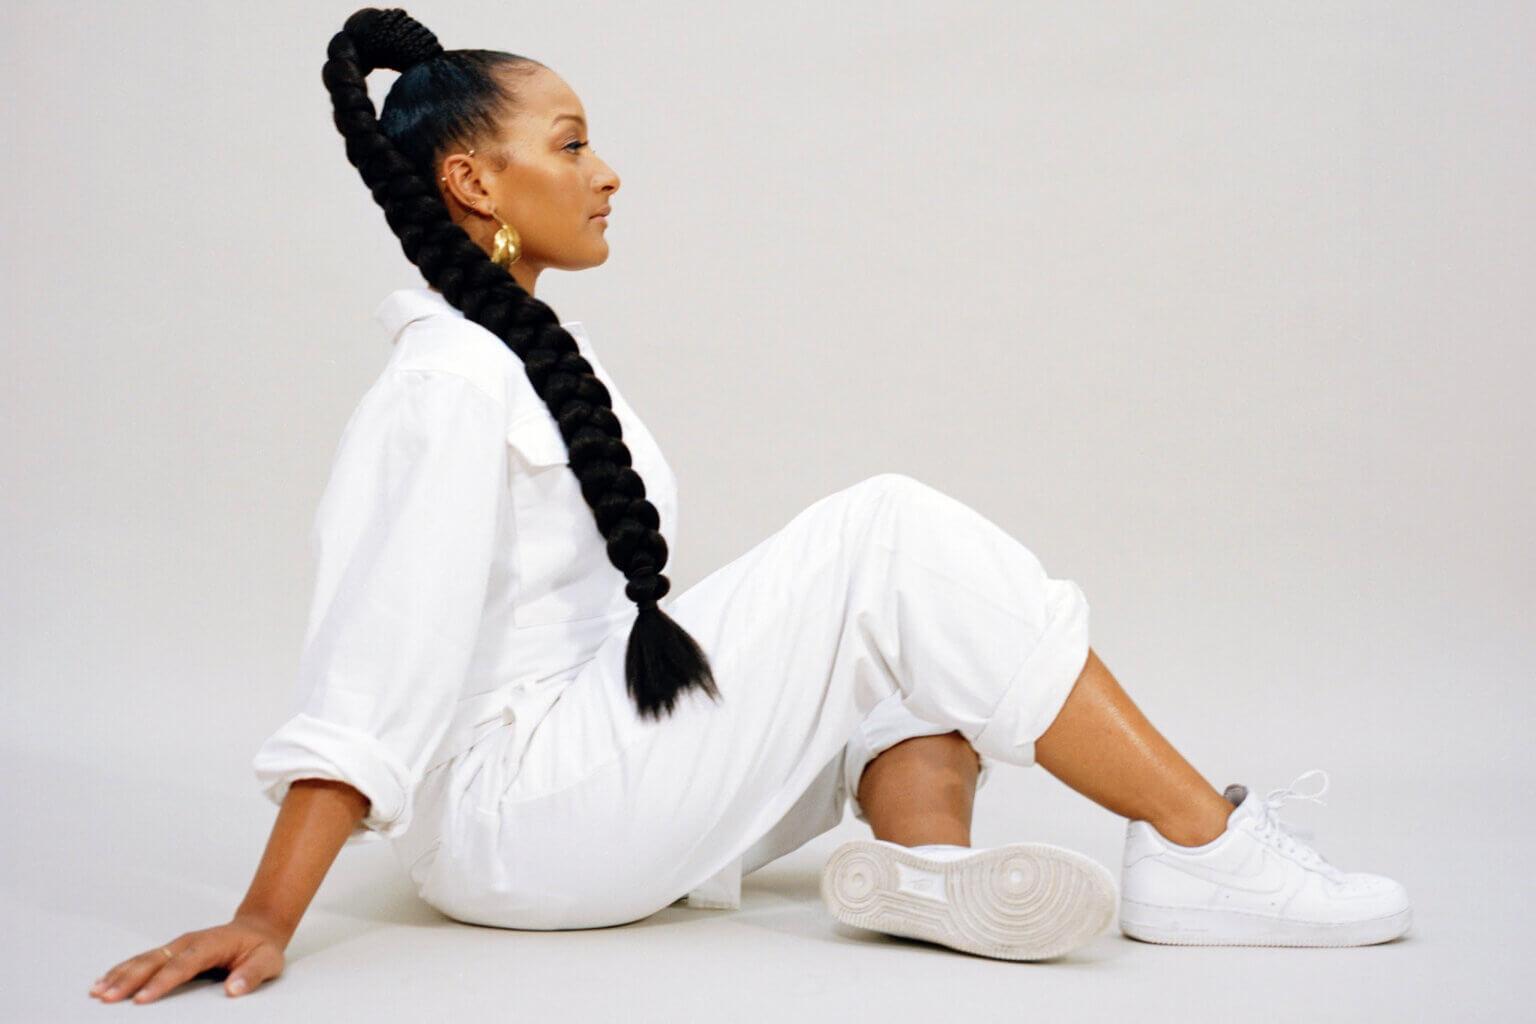 Nubya Garcia has announced a new remix album, Source ⧺ We Move